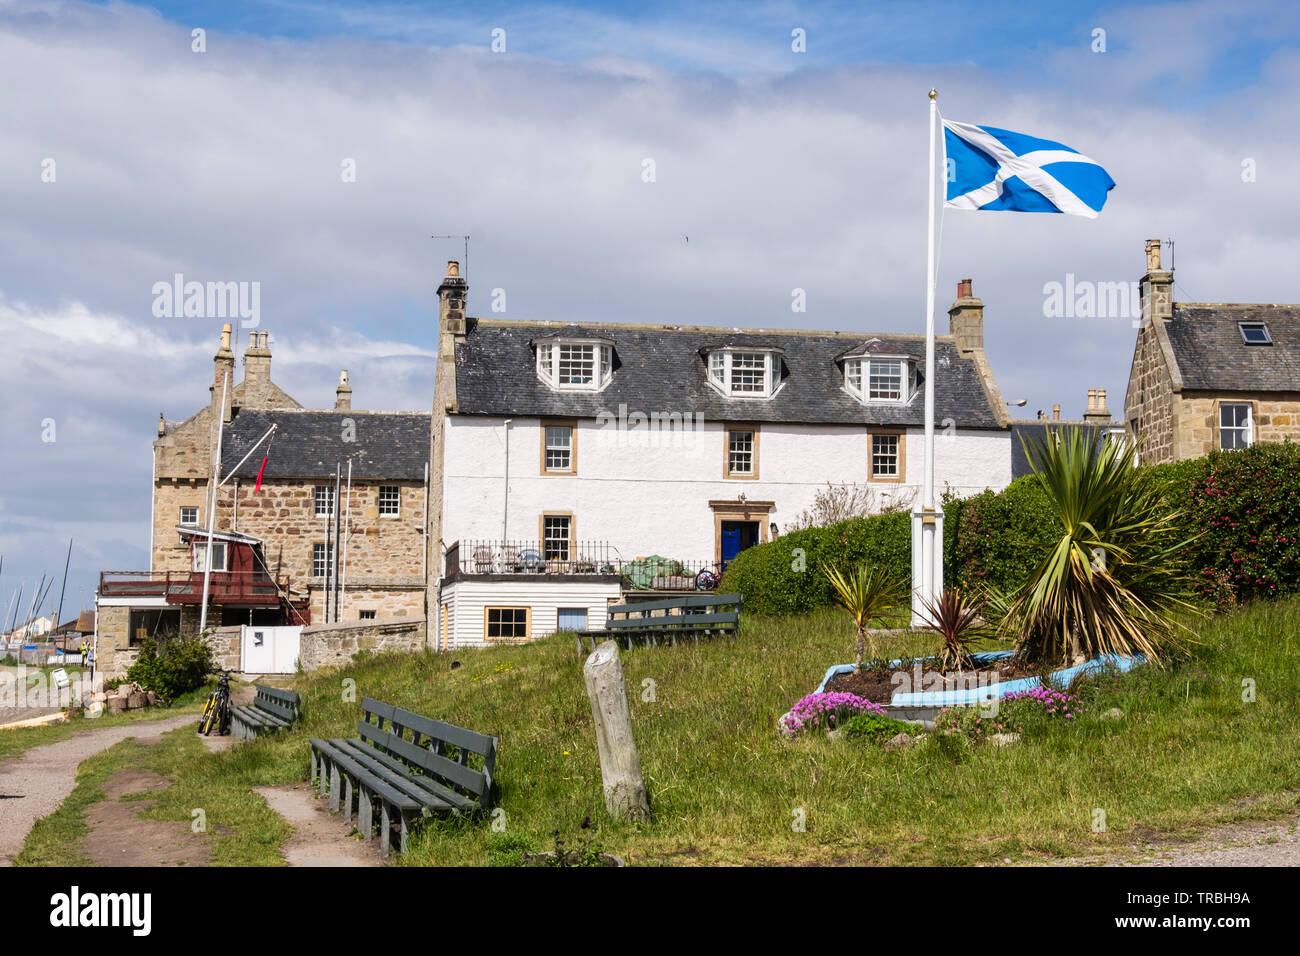 Scottish flag flying outside old buildings in coastal village of Findhorn, Moray, Scotland, UK, Britain Stock Photo